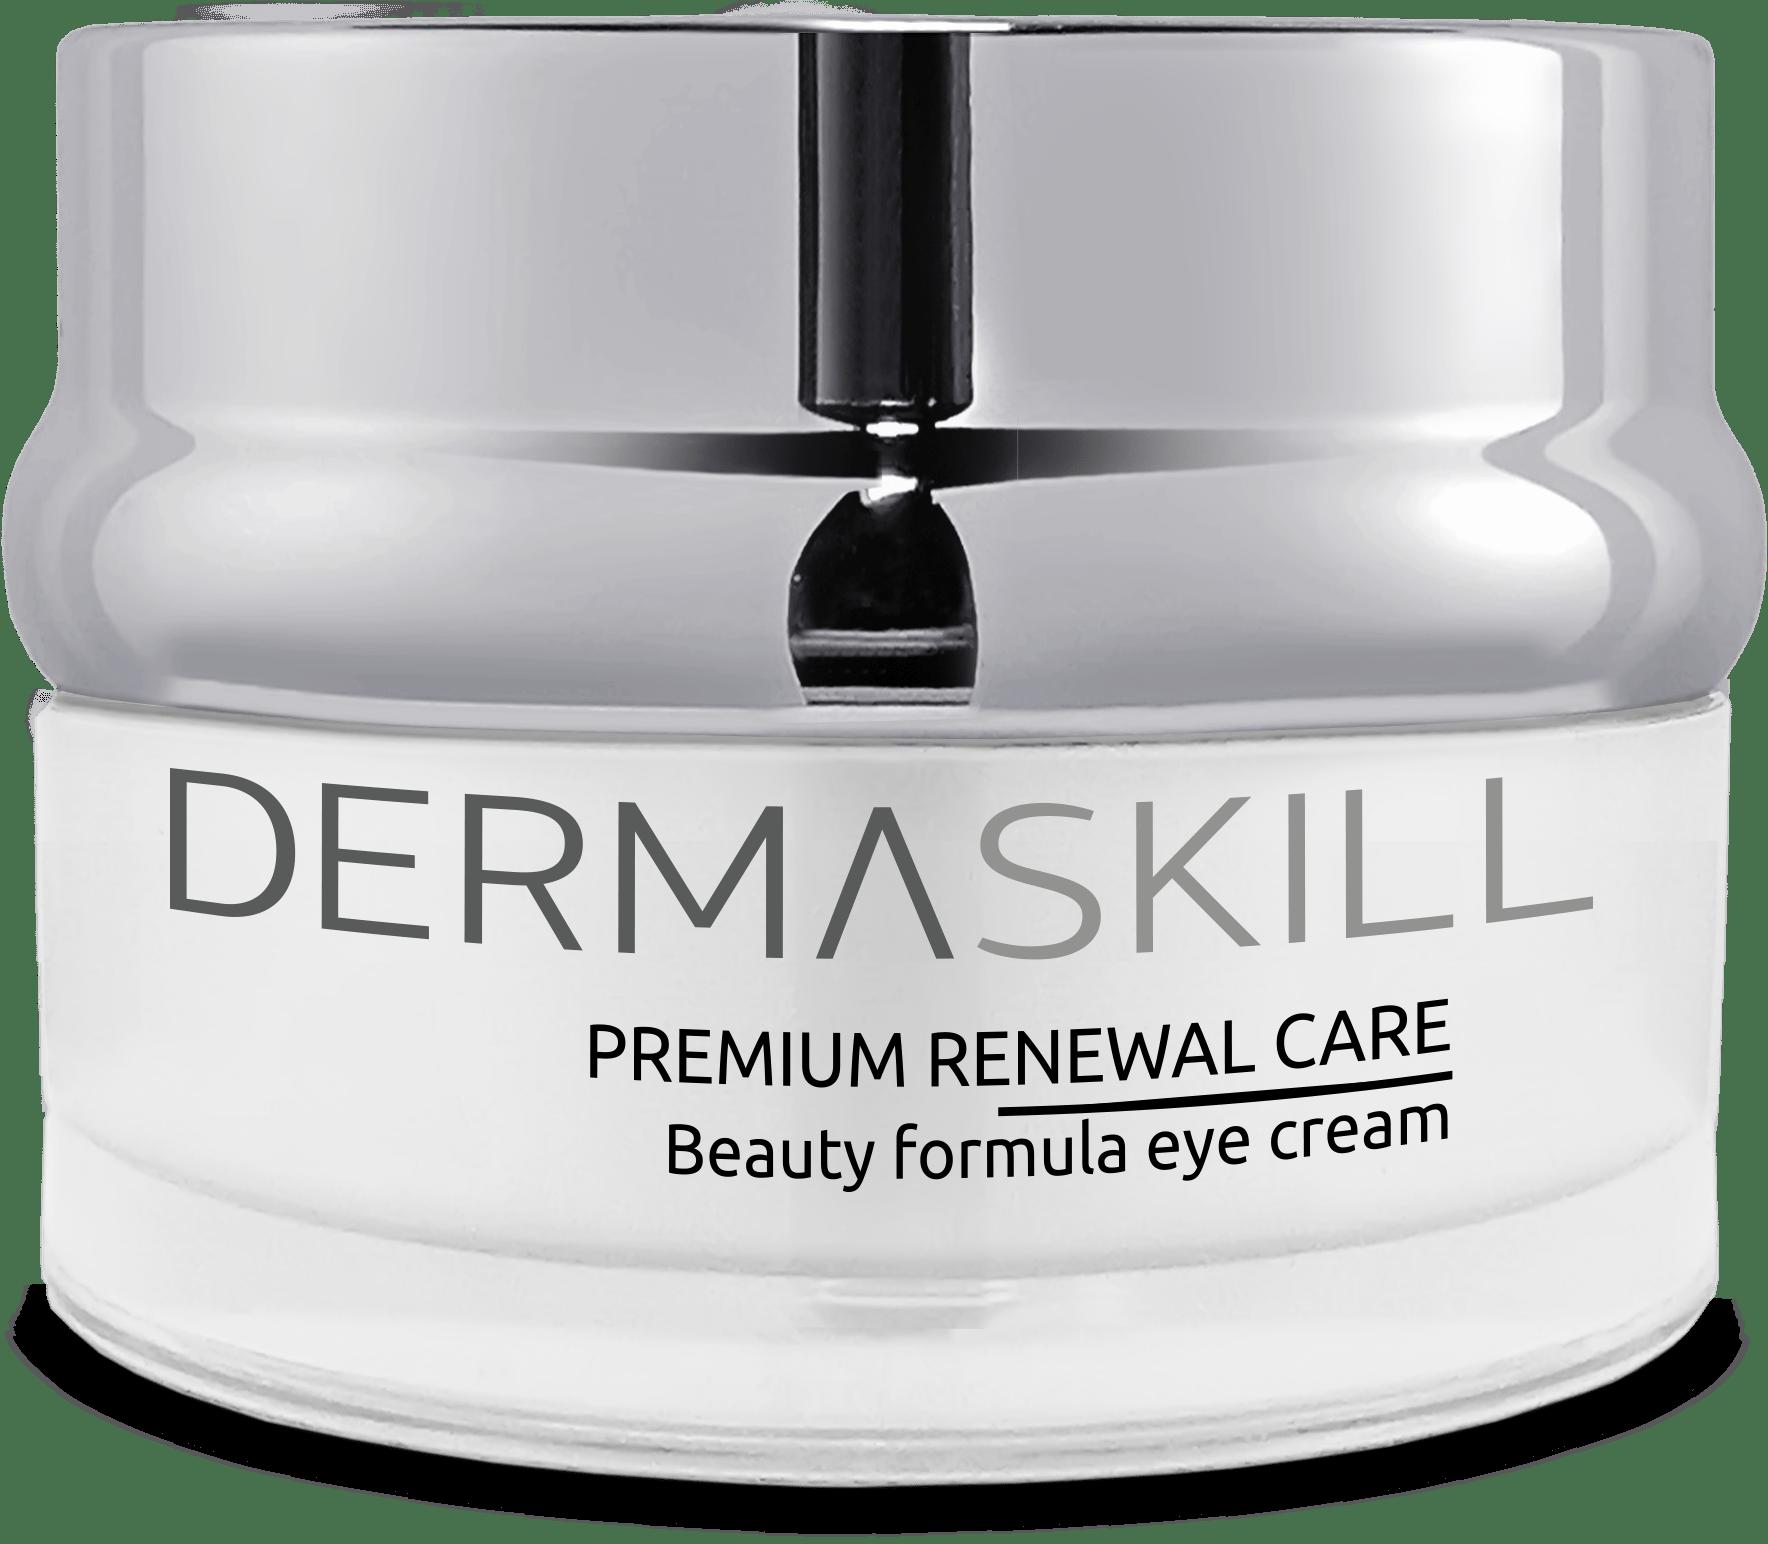 Крем красоты для зоны вокруг глаз Beauty Formula Eye Cream Dermaskill USA 50 мл(р) — фото №1